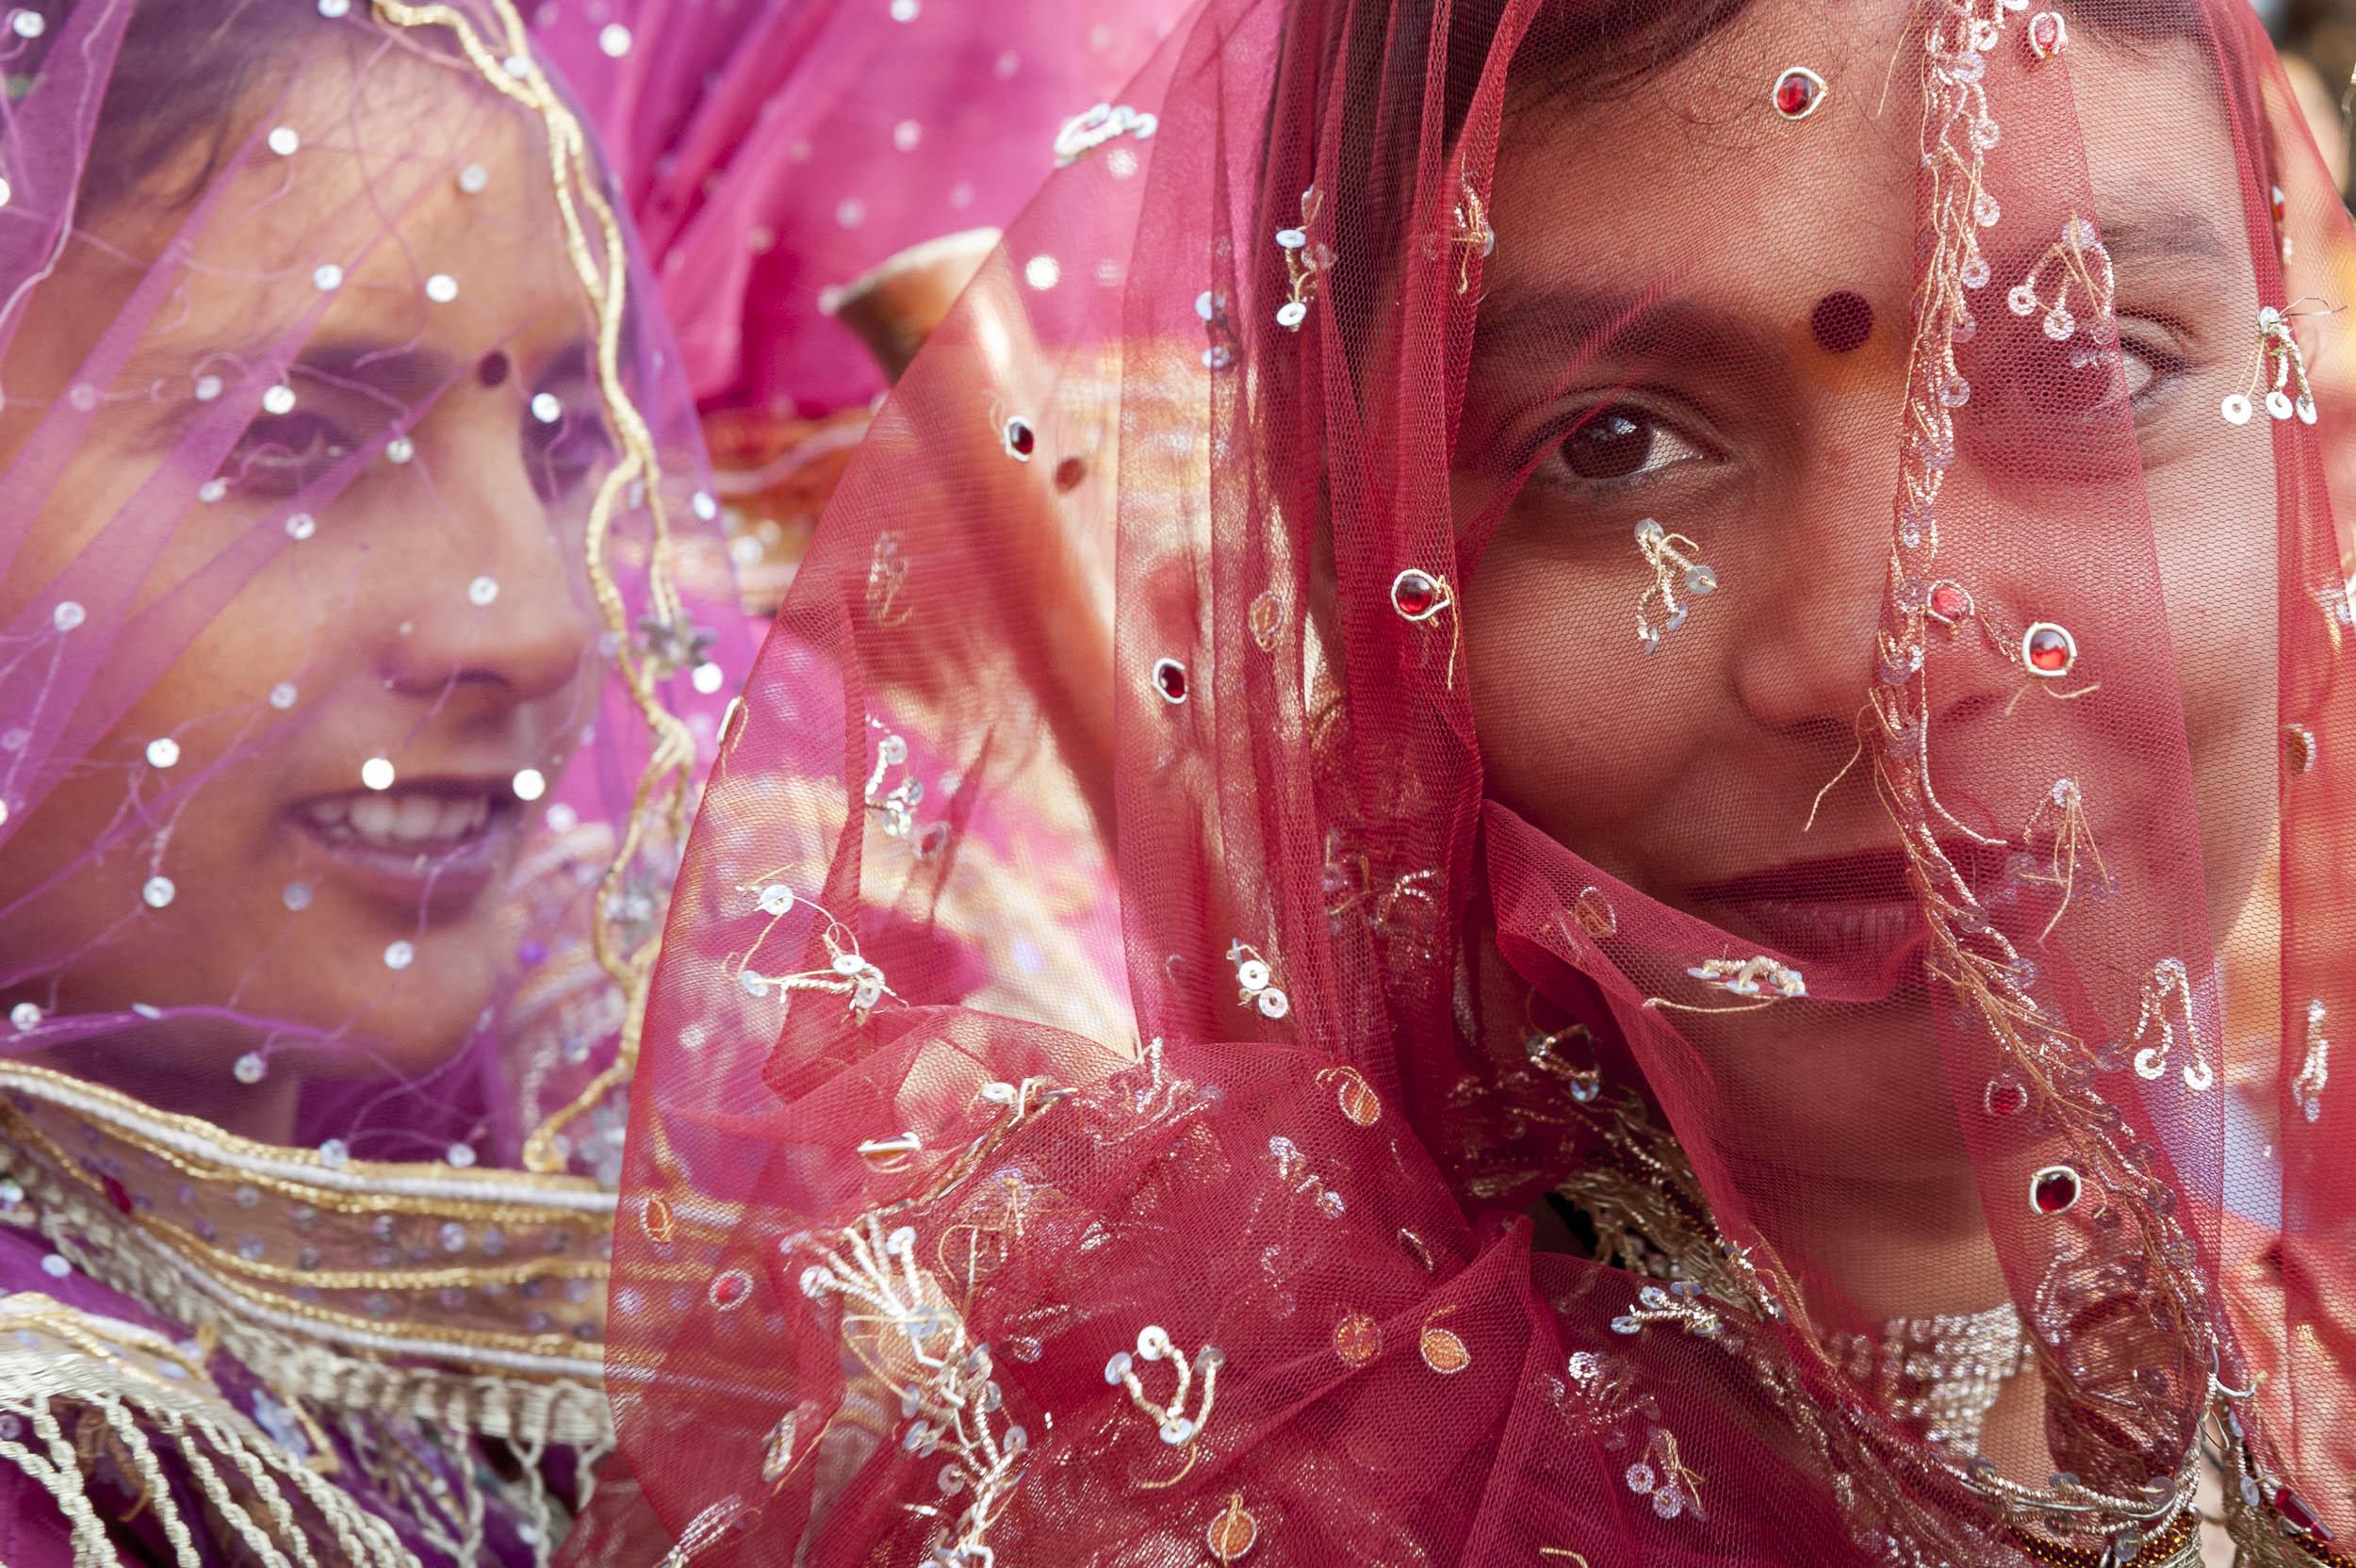 AE_India_Holi_1556.jpg